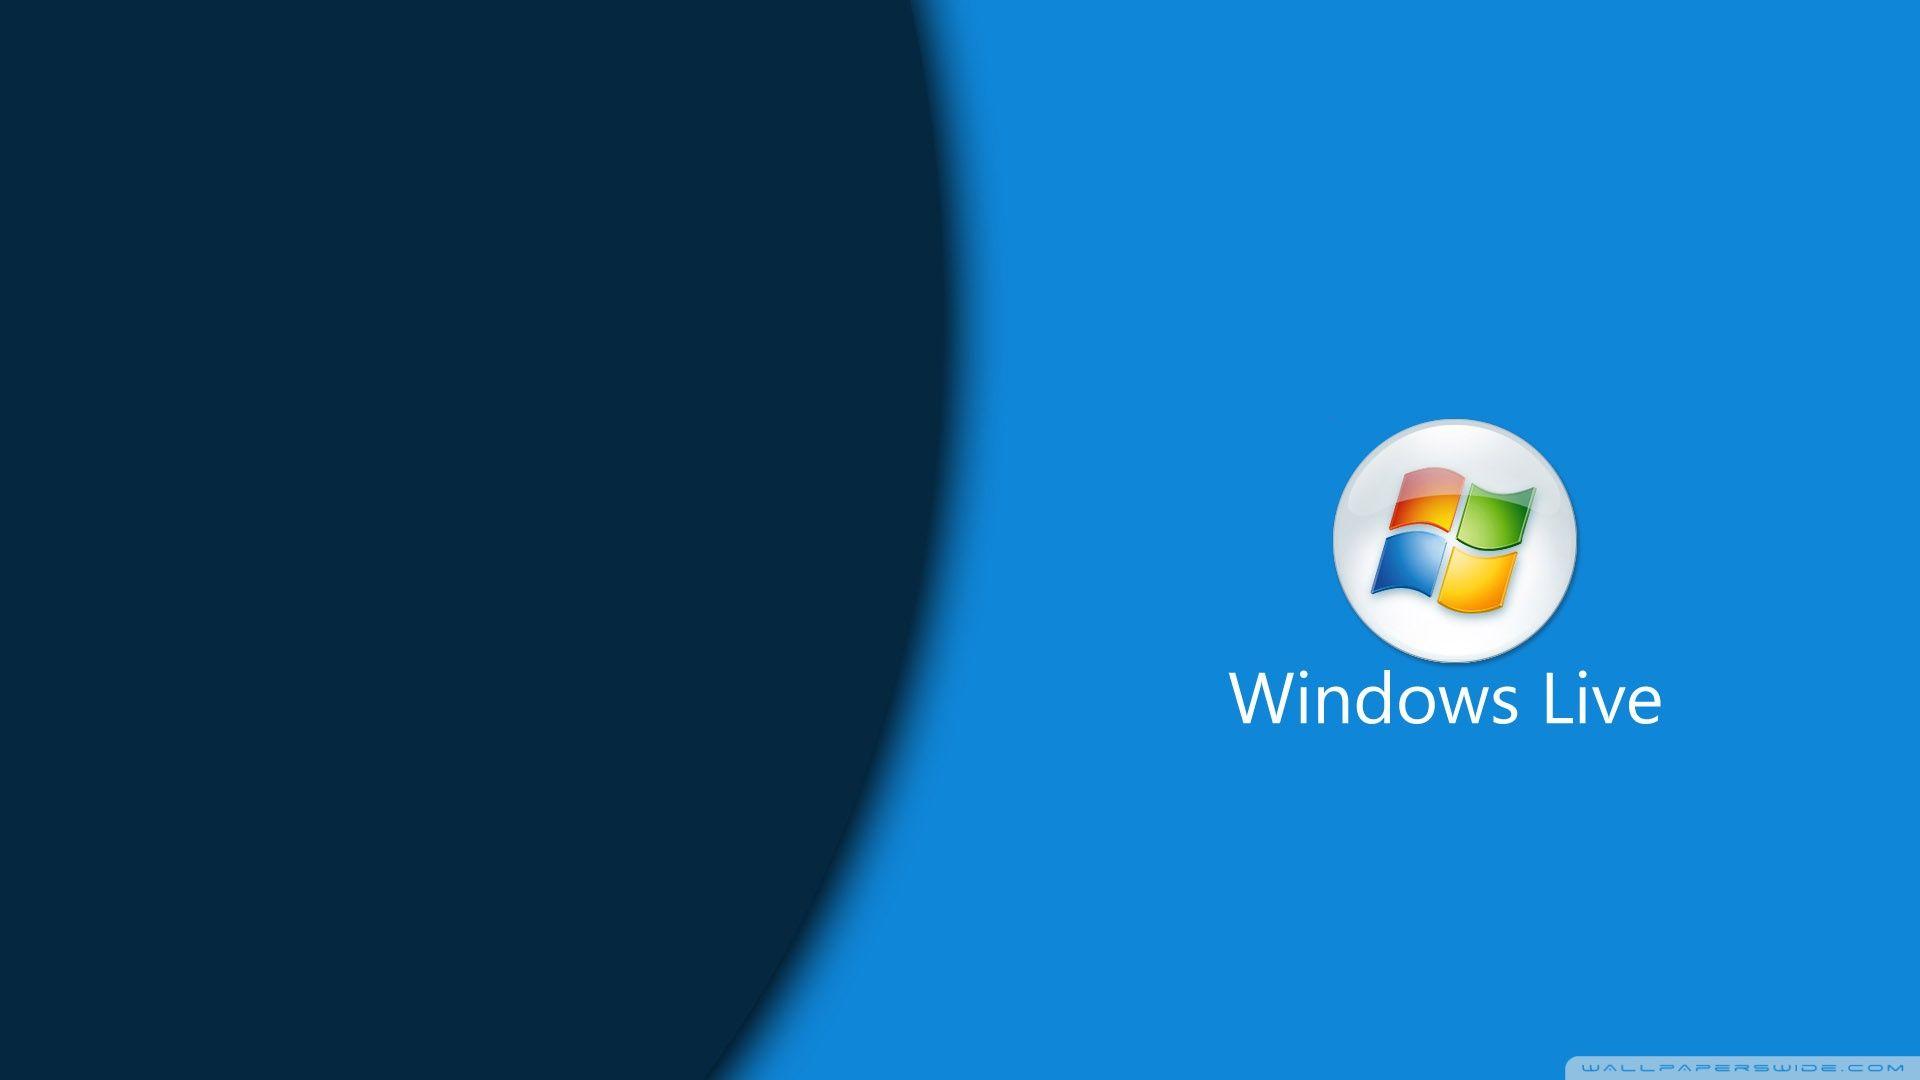 Download Slideshow Wallpaper For Windows 10